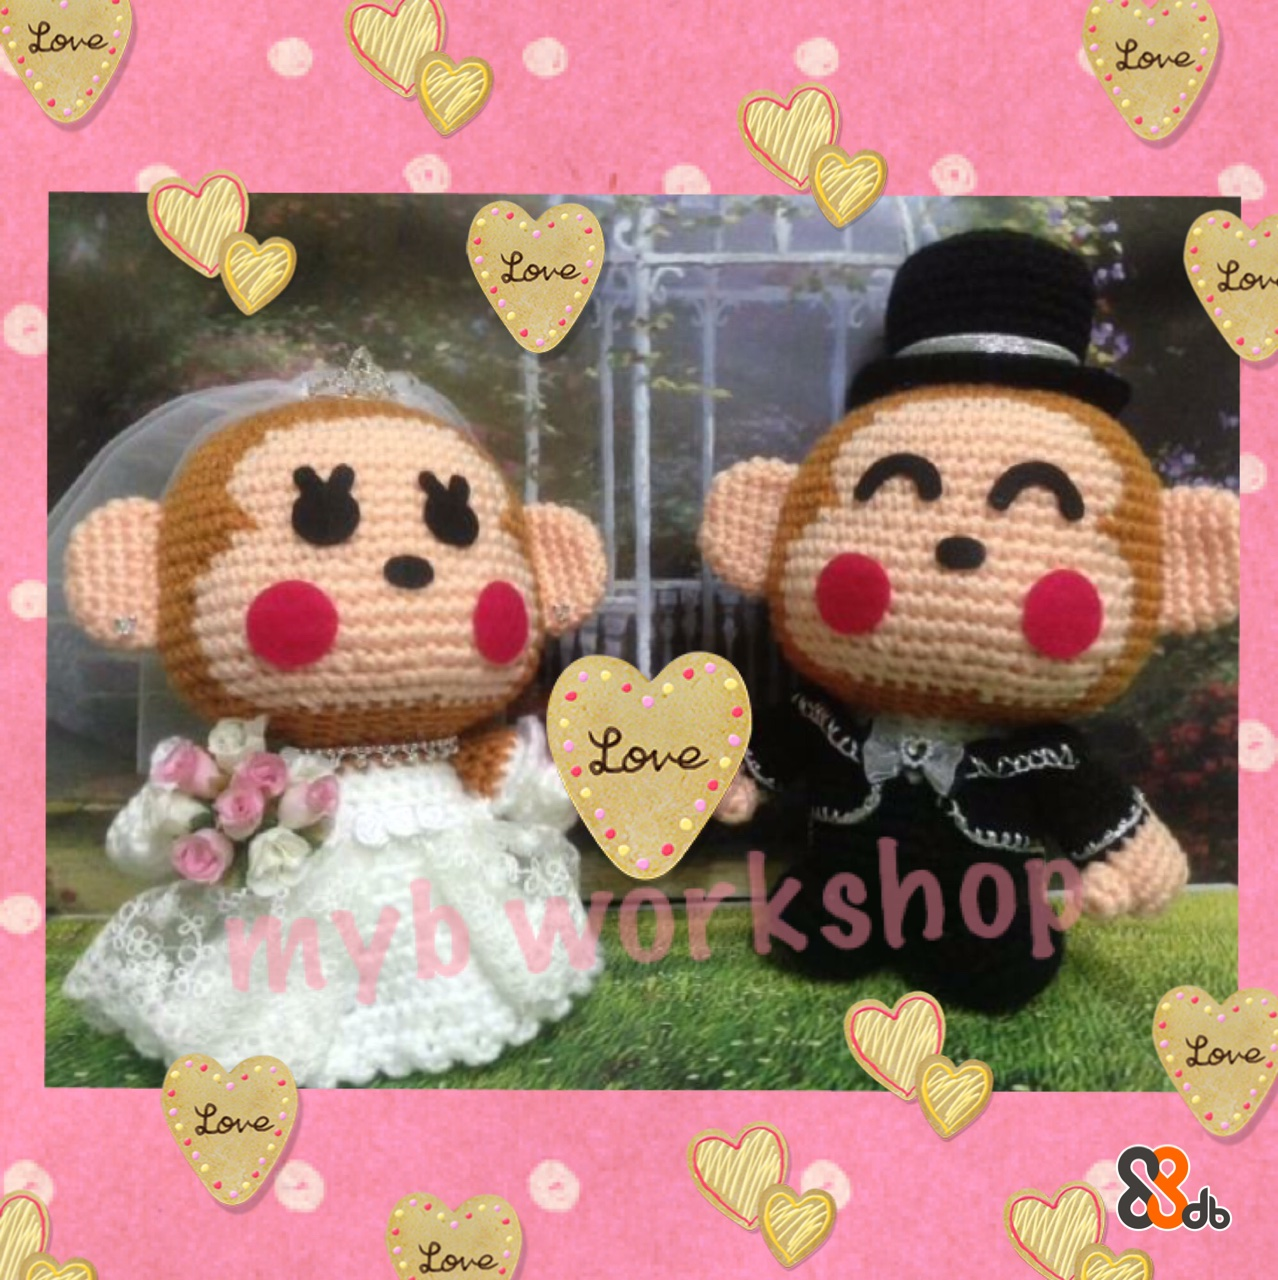 Love Love love Love orkshop Love Love  stuffed toy,pink,plush,textile,toy